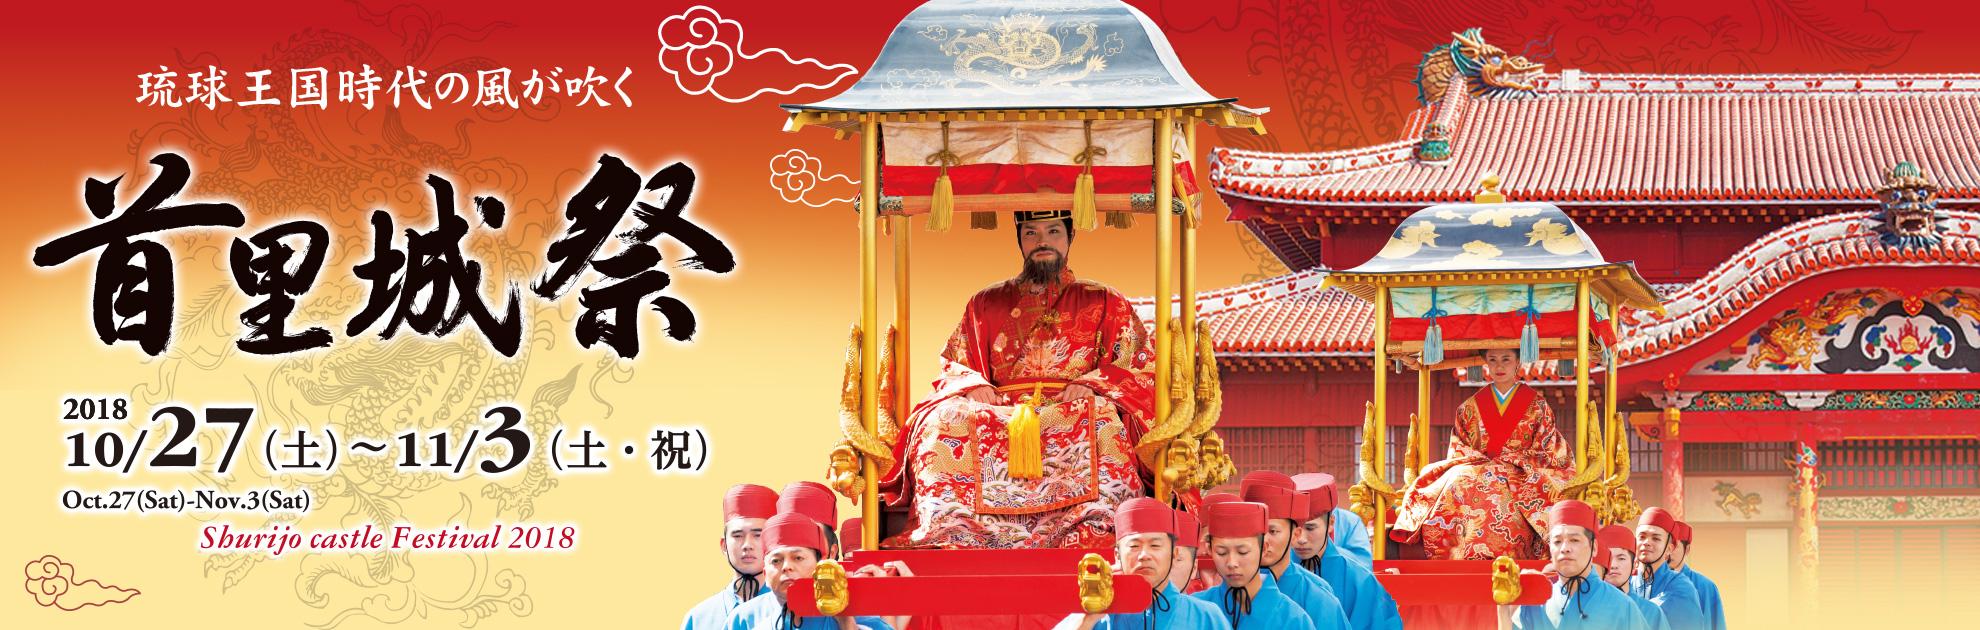 Shurijo Castle Park Shuri Castle Festival